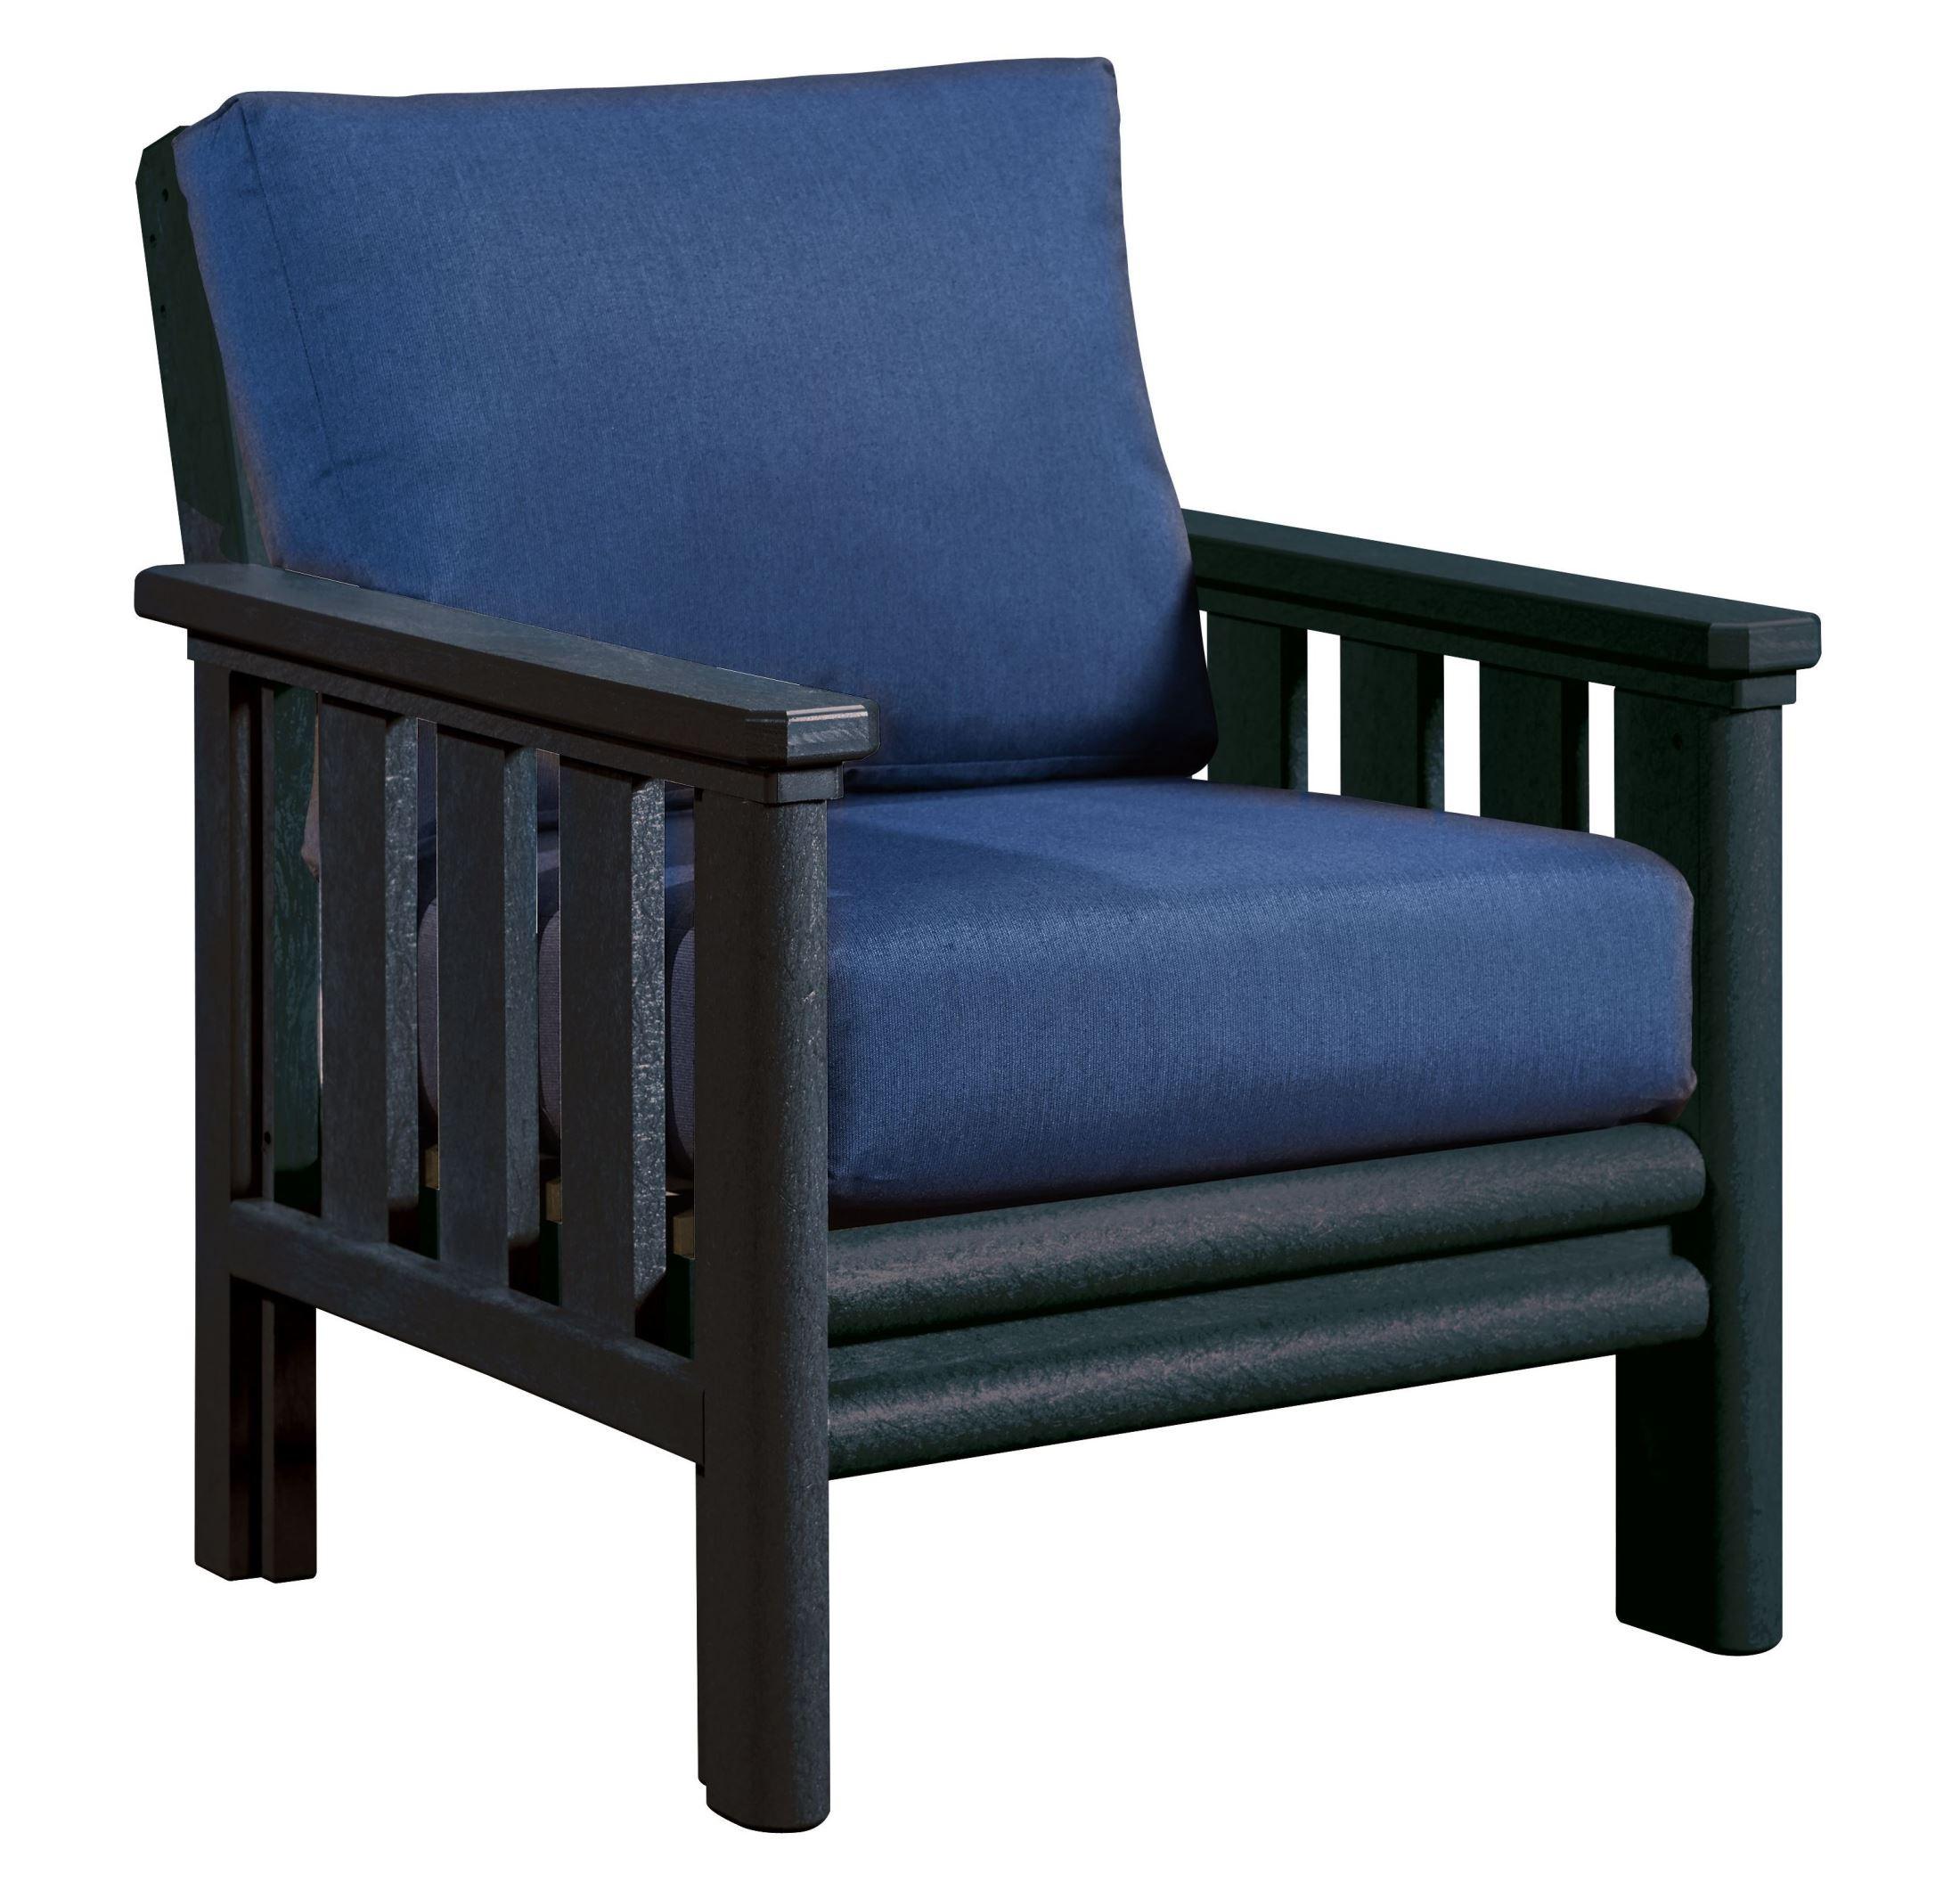 Stratford Black Outdoor Living Set From Cr Plastic Ds143 14 48080 Coleman Furniture